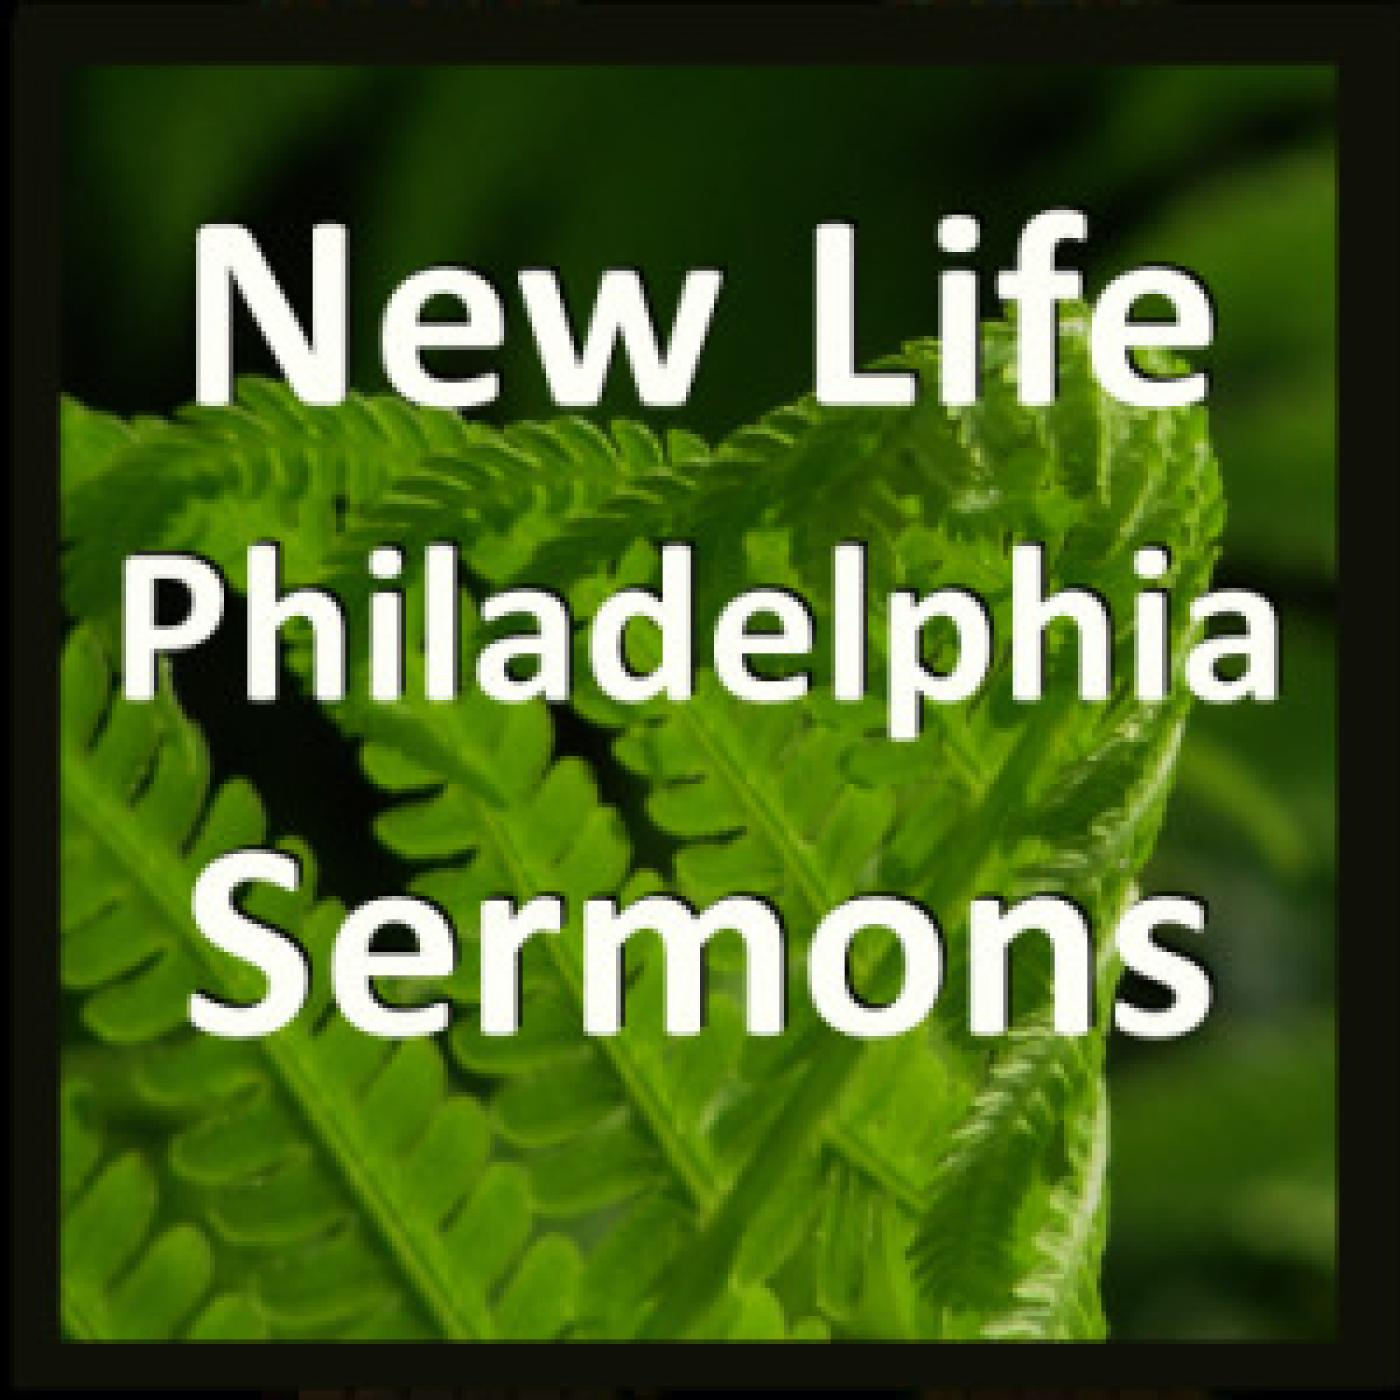 New Life Philadelphia Sermons